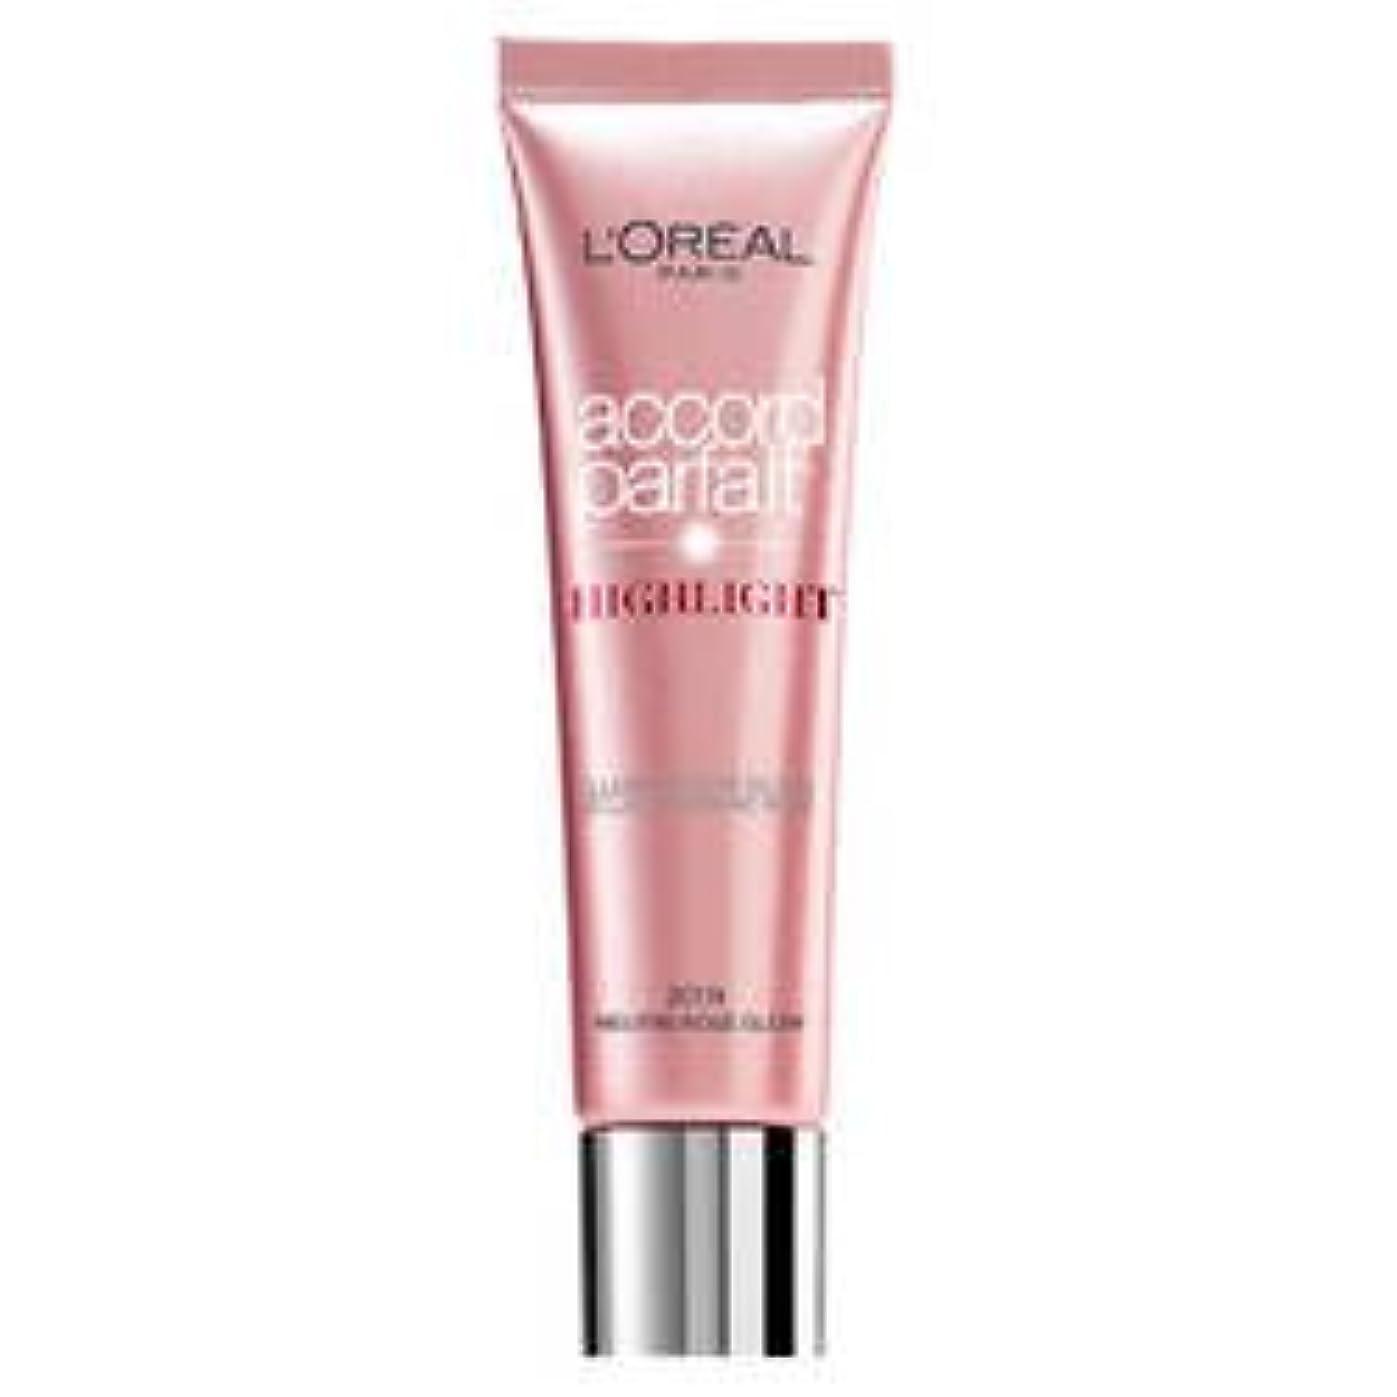 死汚物脅迫L 'Oréal Paris - ACCORD PARFAIT Highlight Enlumineur Liquide - 201 Rose